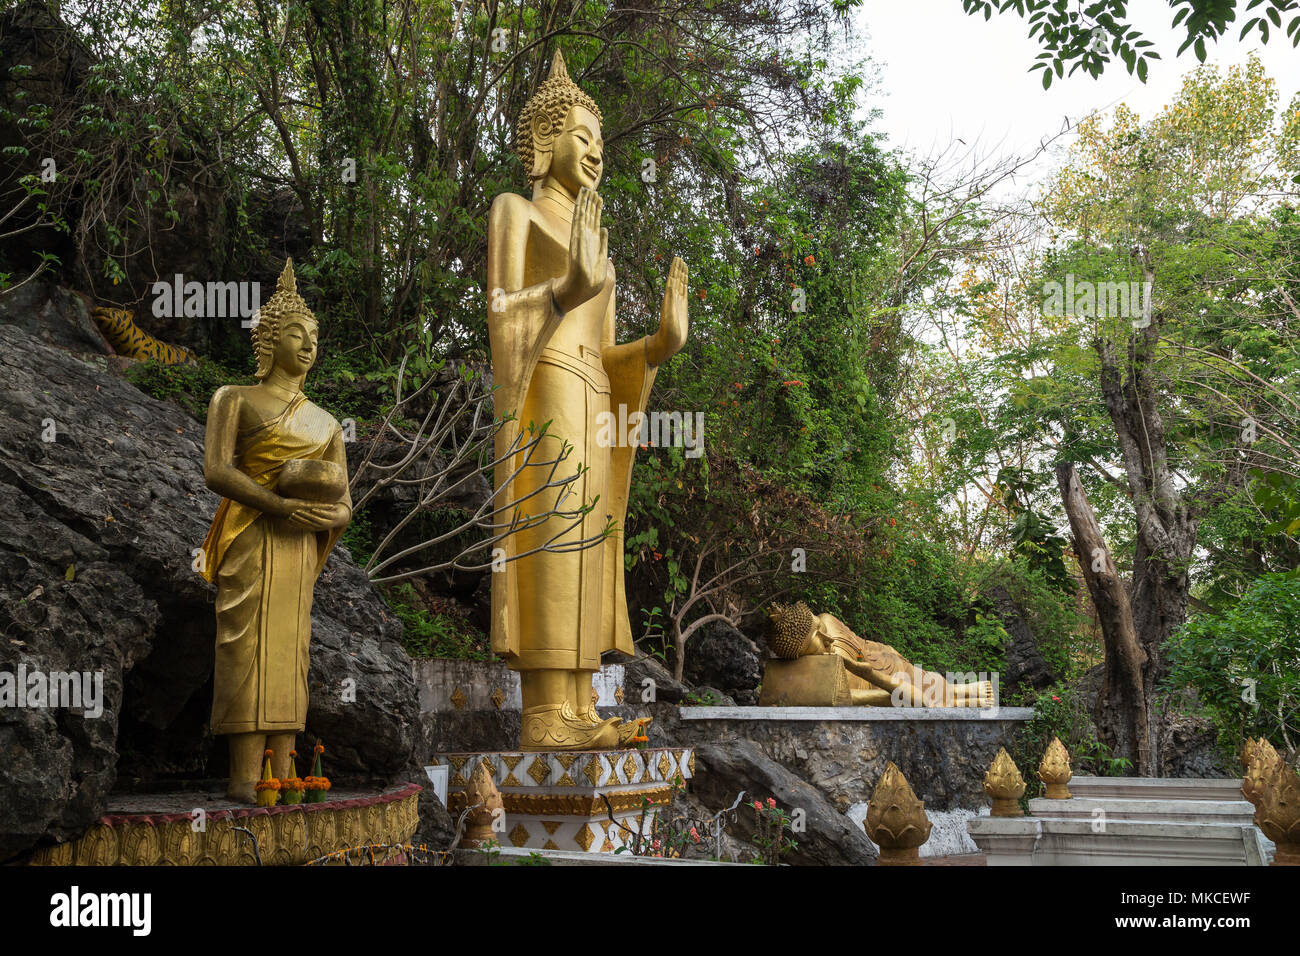 Three golden Buddha statues at the Mount Phousi (Phou Si, Phusi, Phu Si) in Luang Prabang, Laos. - Stock Image